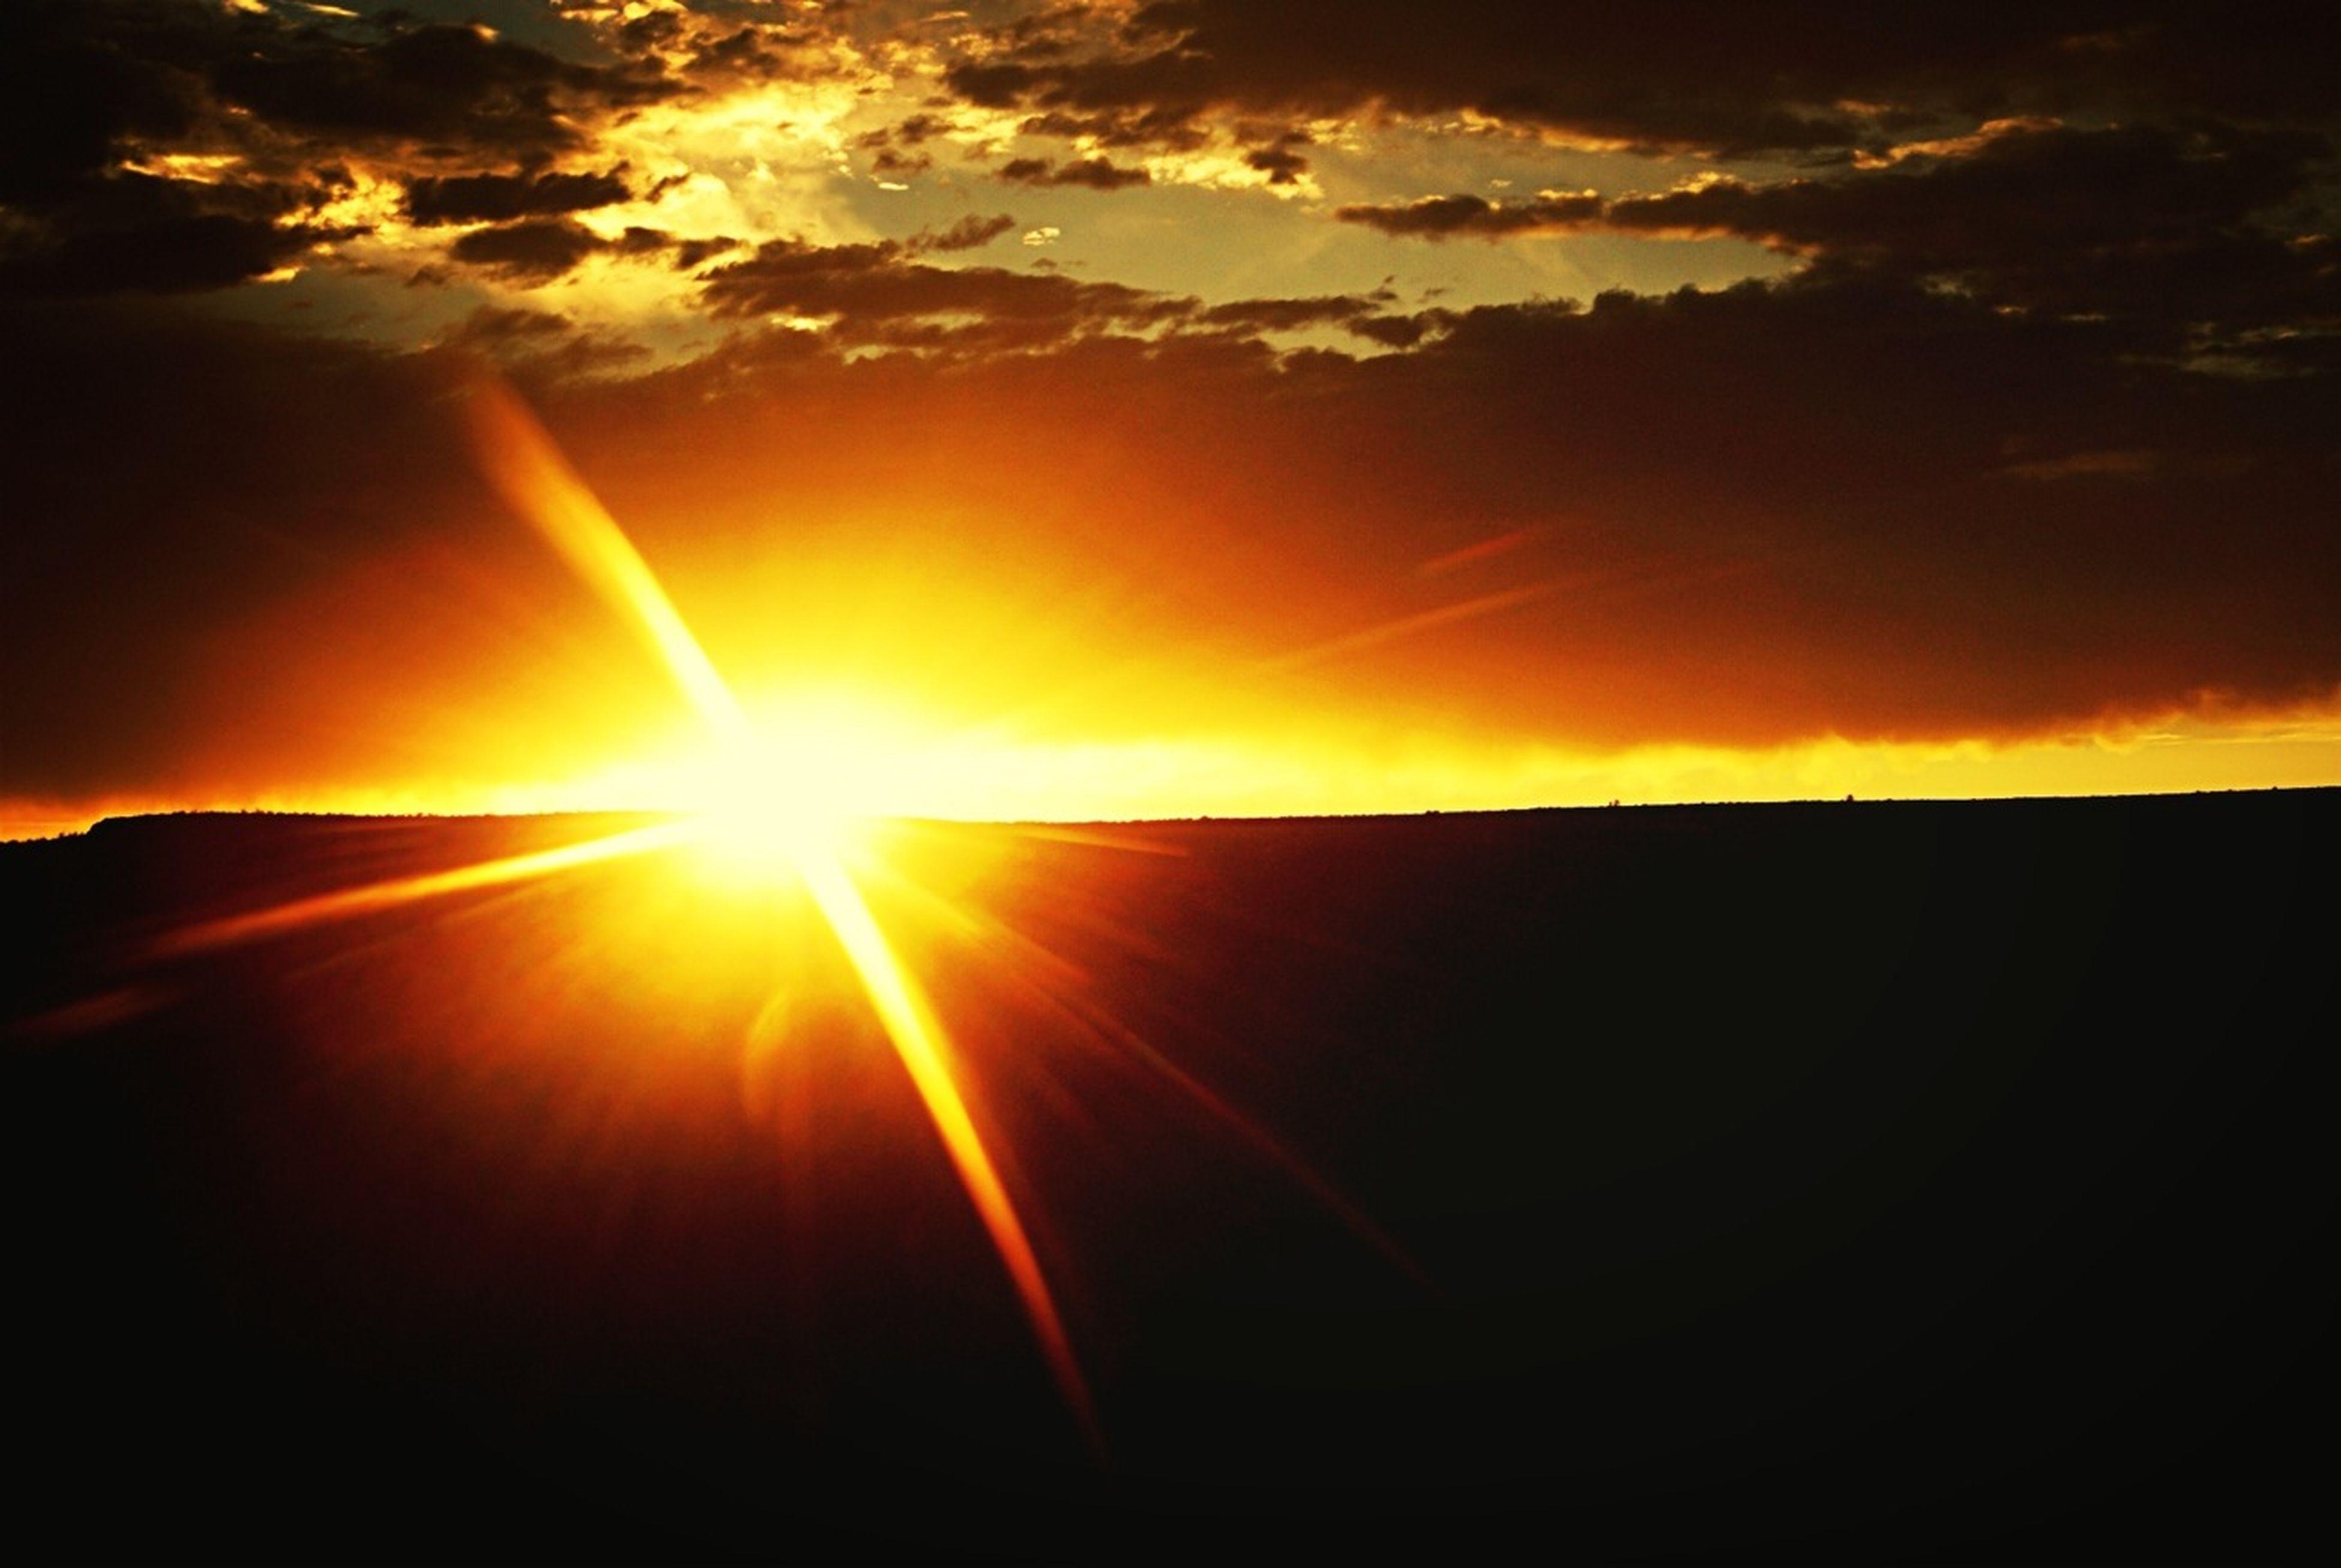 sunset, sun, orange color, scenics, beauty in nature, sky, tranquil scene, tranquility, sunbeam, sunlight, idyllic, silhouette, nature, cloud - sky, lens flare, majestic, dramatic sky, cloud, outdoors, back lit